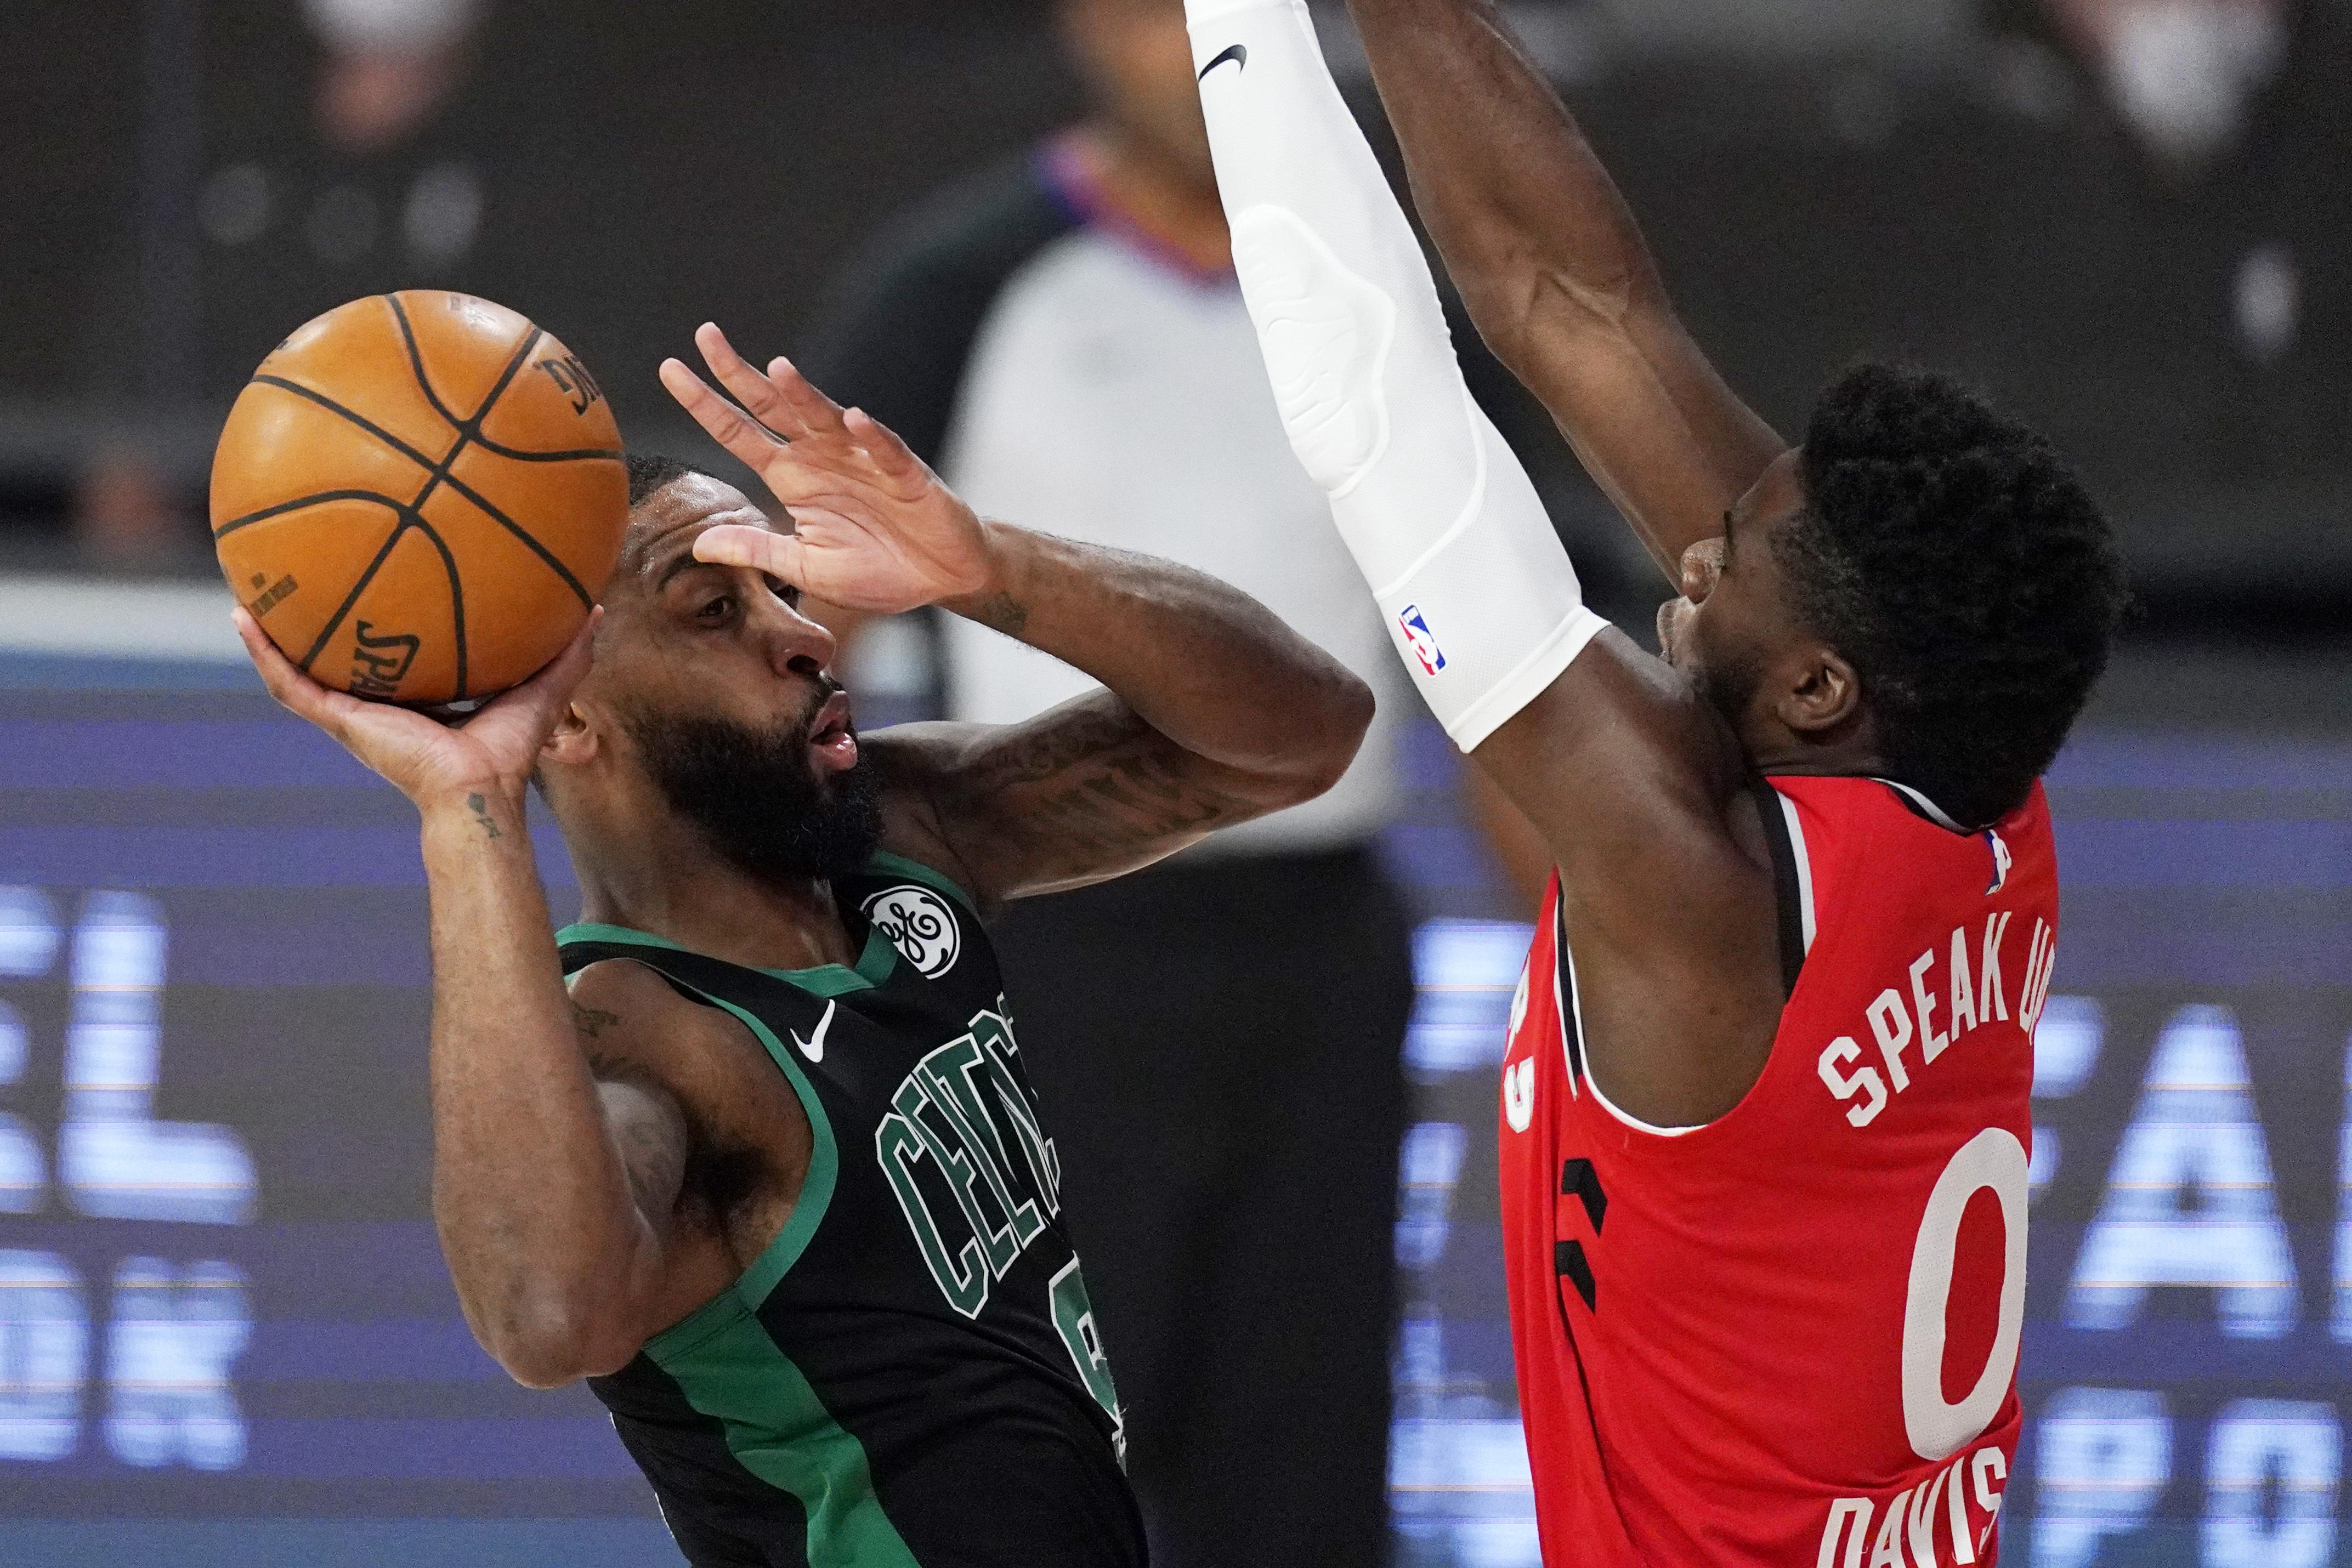 Celtics Vs Raptors Ot Live Stream 9 9 How To Watch Nba Playoffs Game 6 Online Tv Time Al Com